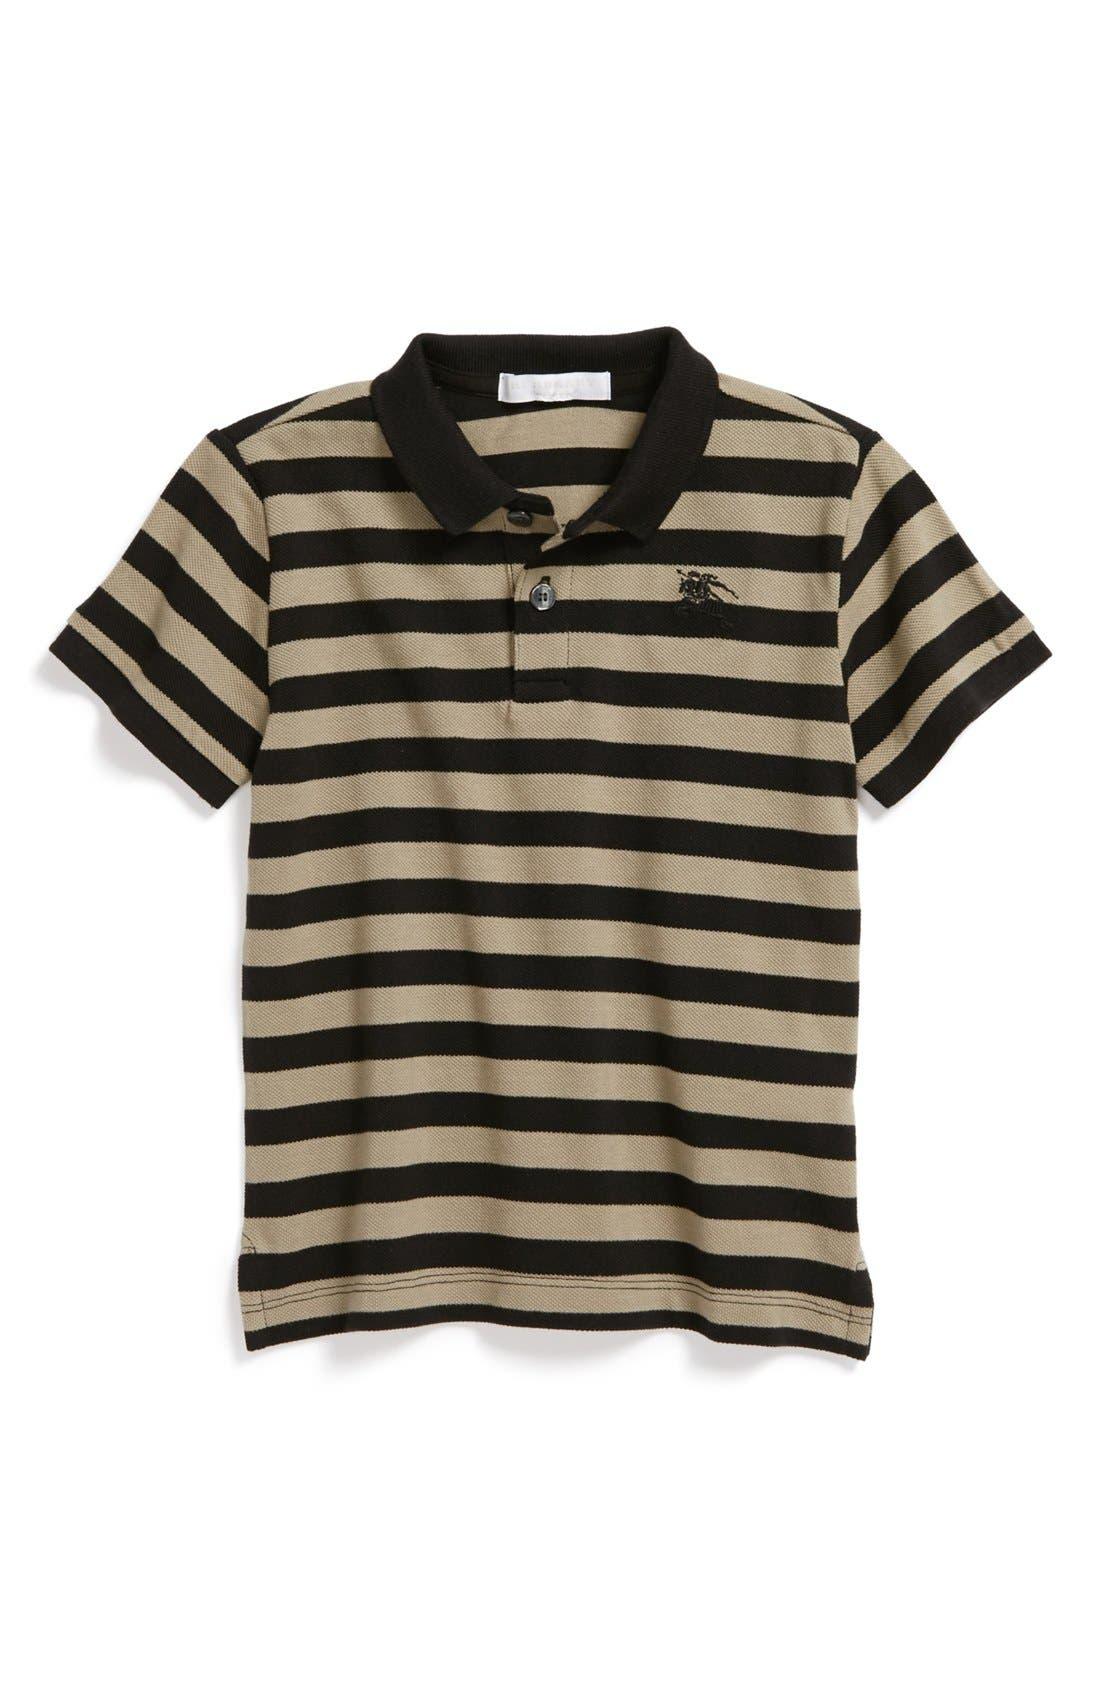 Main Image - Burberry 'Hemel' Stripe Polo (Toddler Boys, Little Boys & Big Boys)